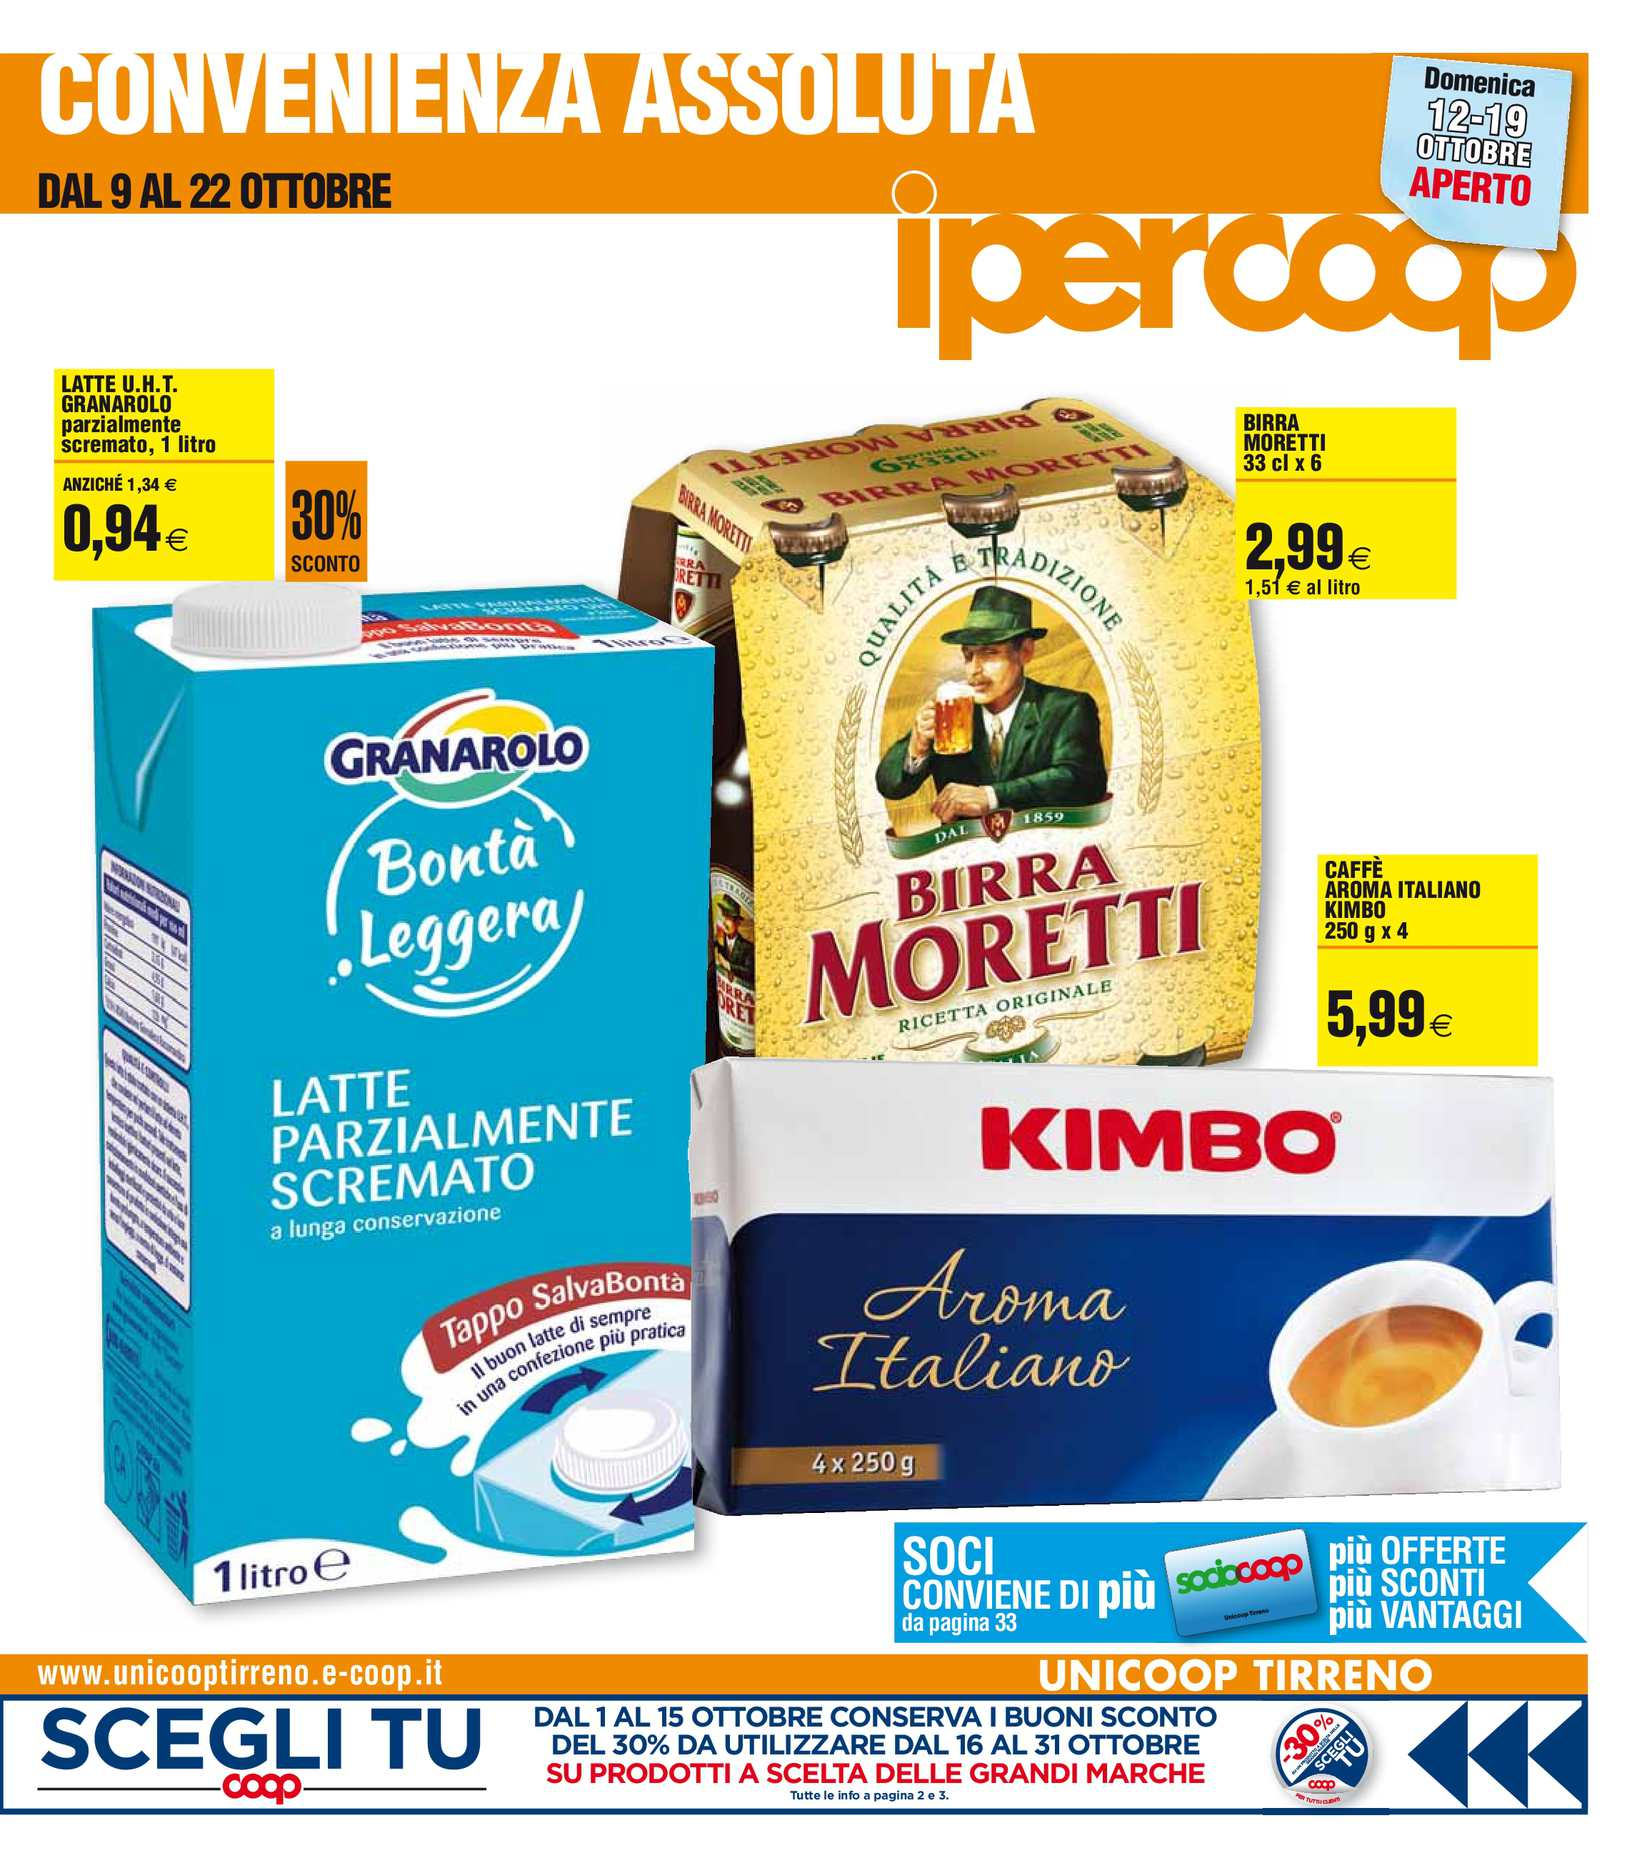 Calaméo - Volantino Coop Iper Lazio 9-22 ottobre 42b9308ec99